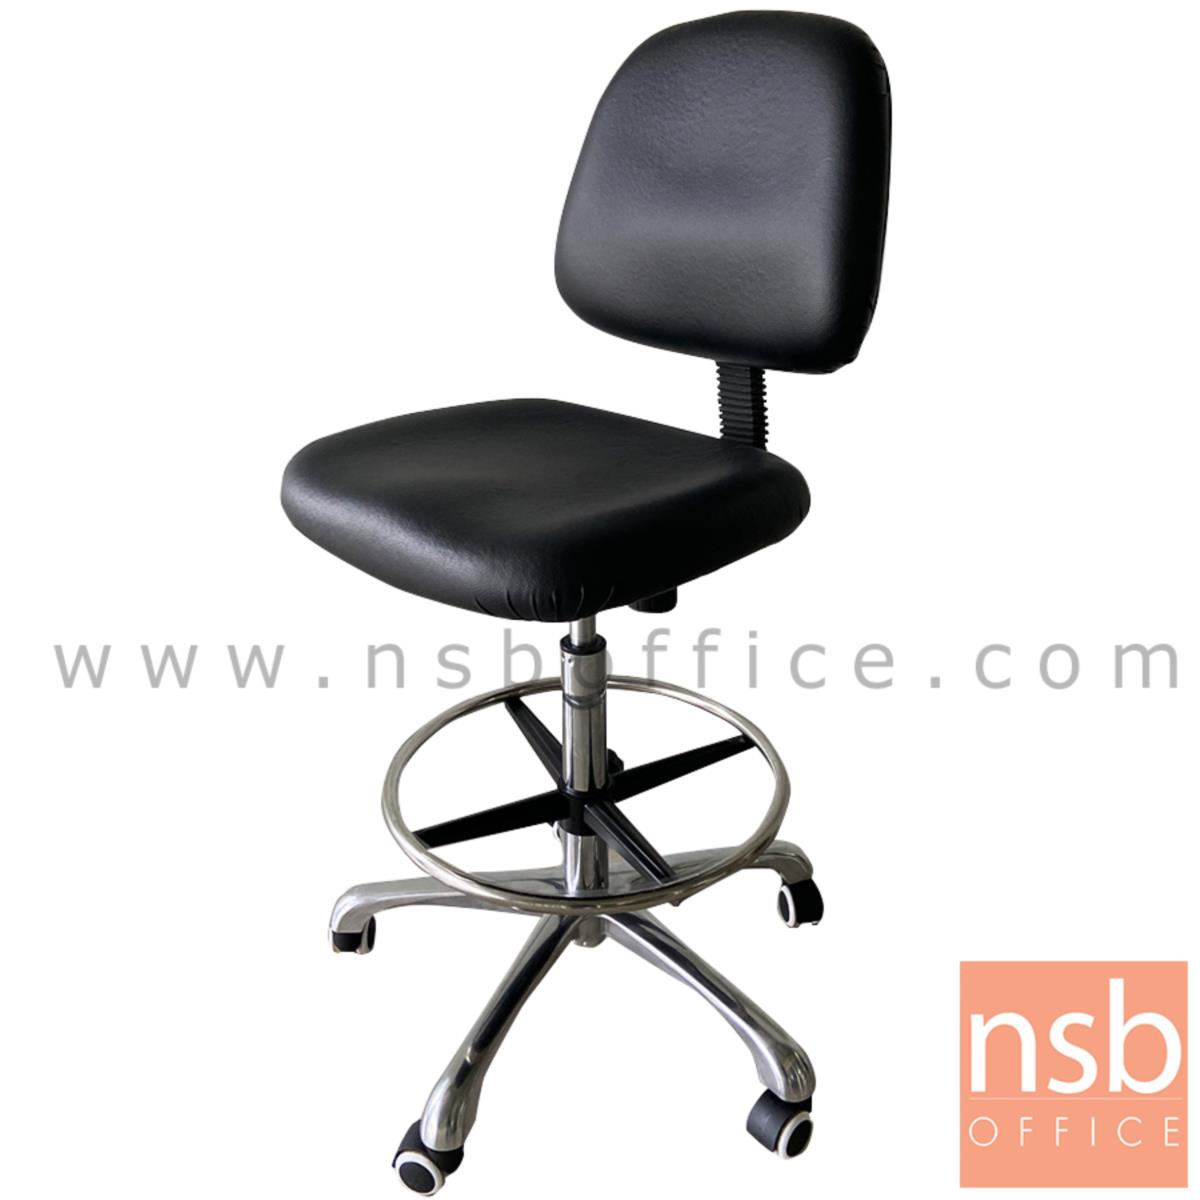 B02A097:เก้าอี้บาร์ รุ่น Birken (เบอร์เคน) ขนาด 56W cm. โช๊คแก๊ส มีวงเหยียบ